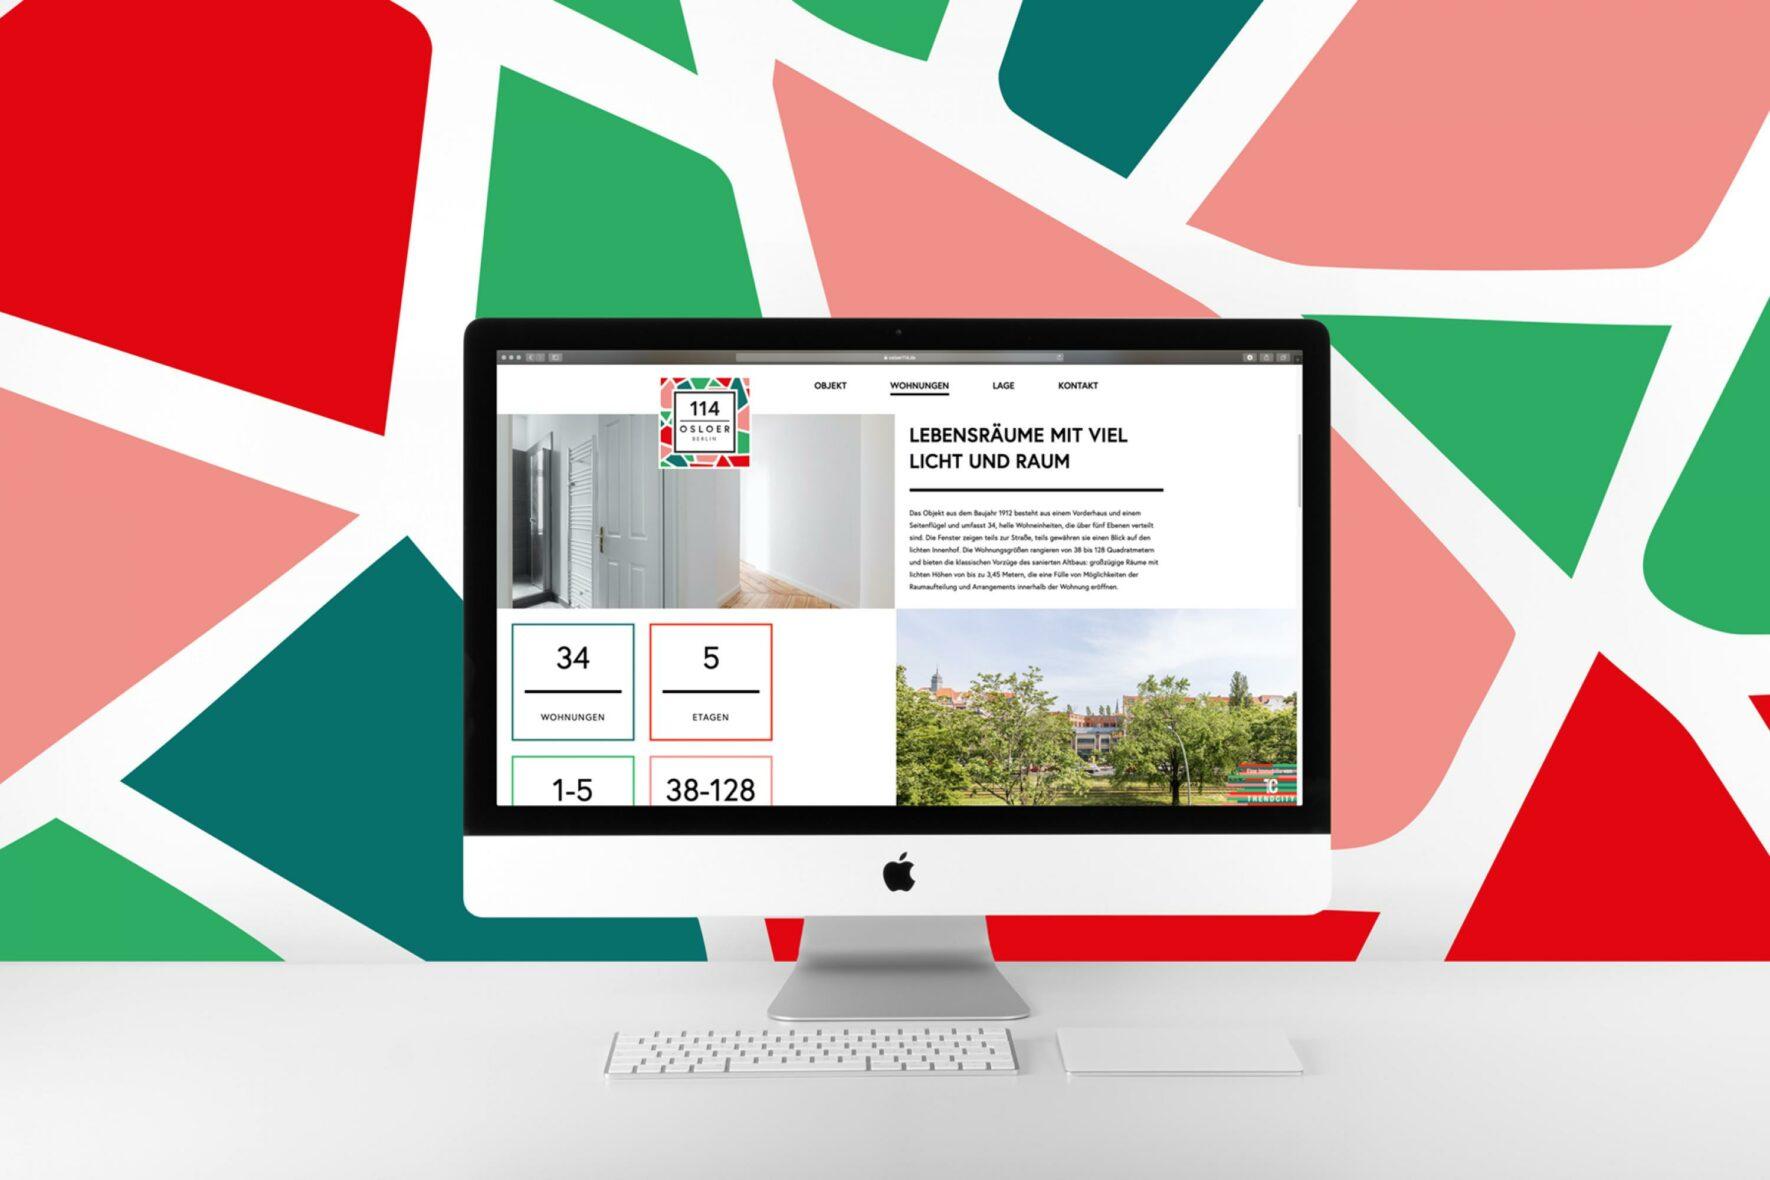 Webdesign-Osloer114-Trendcity-Immobilien-FORMLOS-Berlin-Design-5